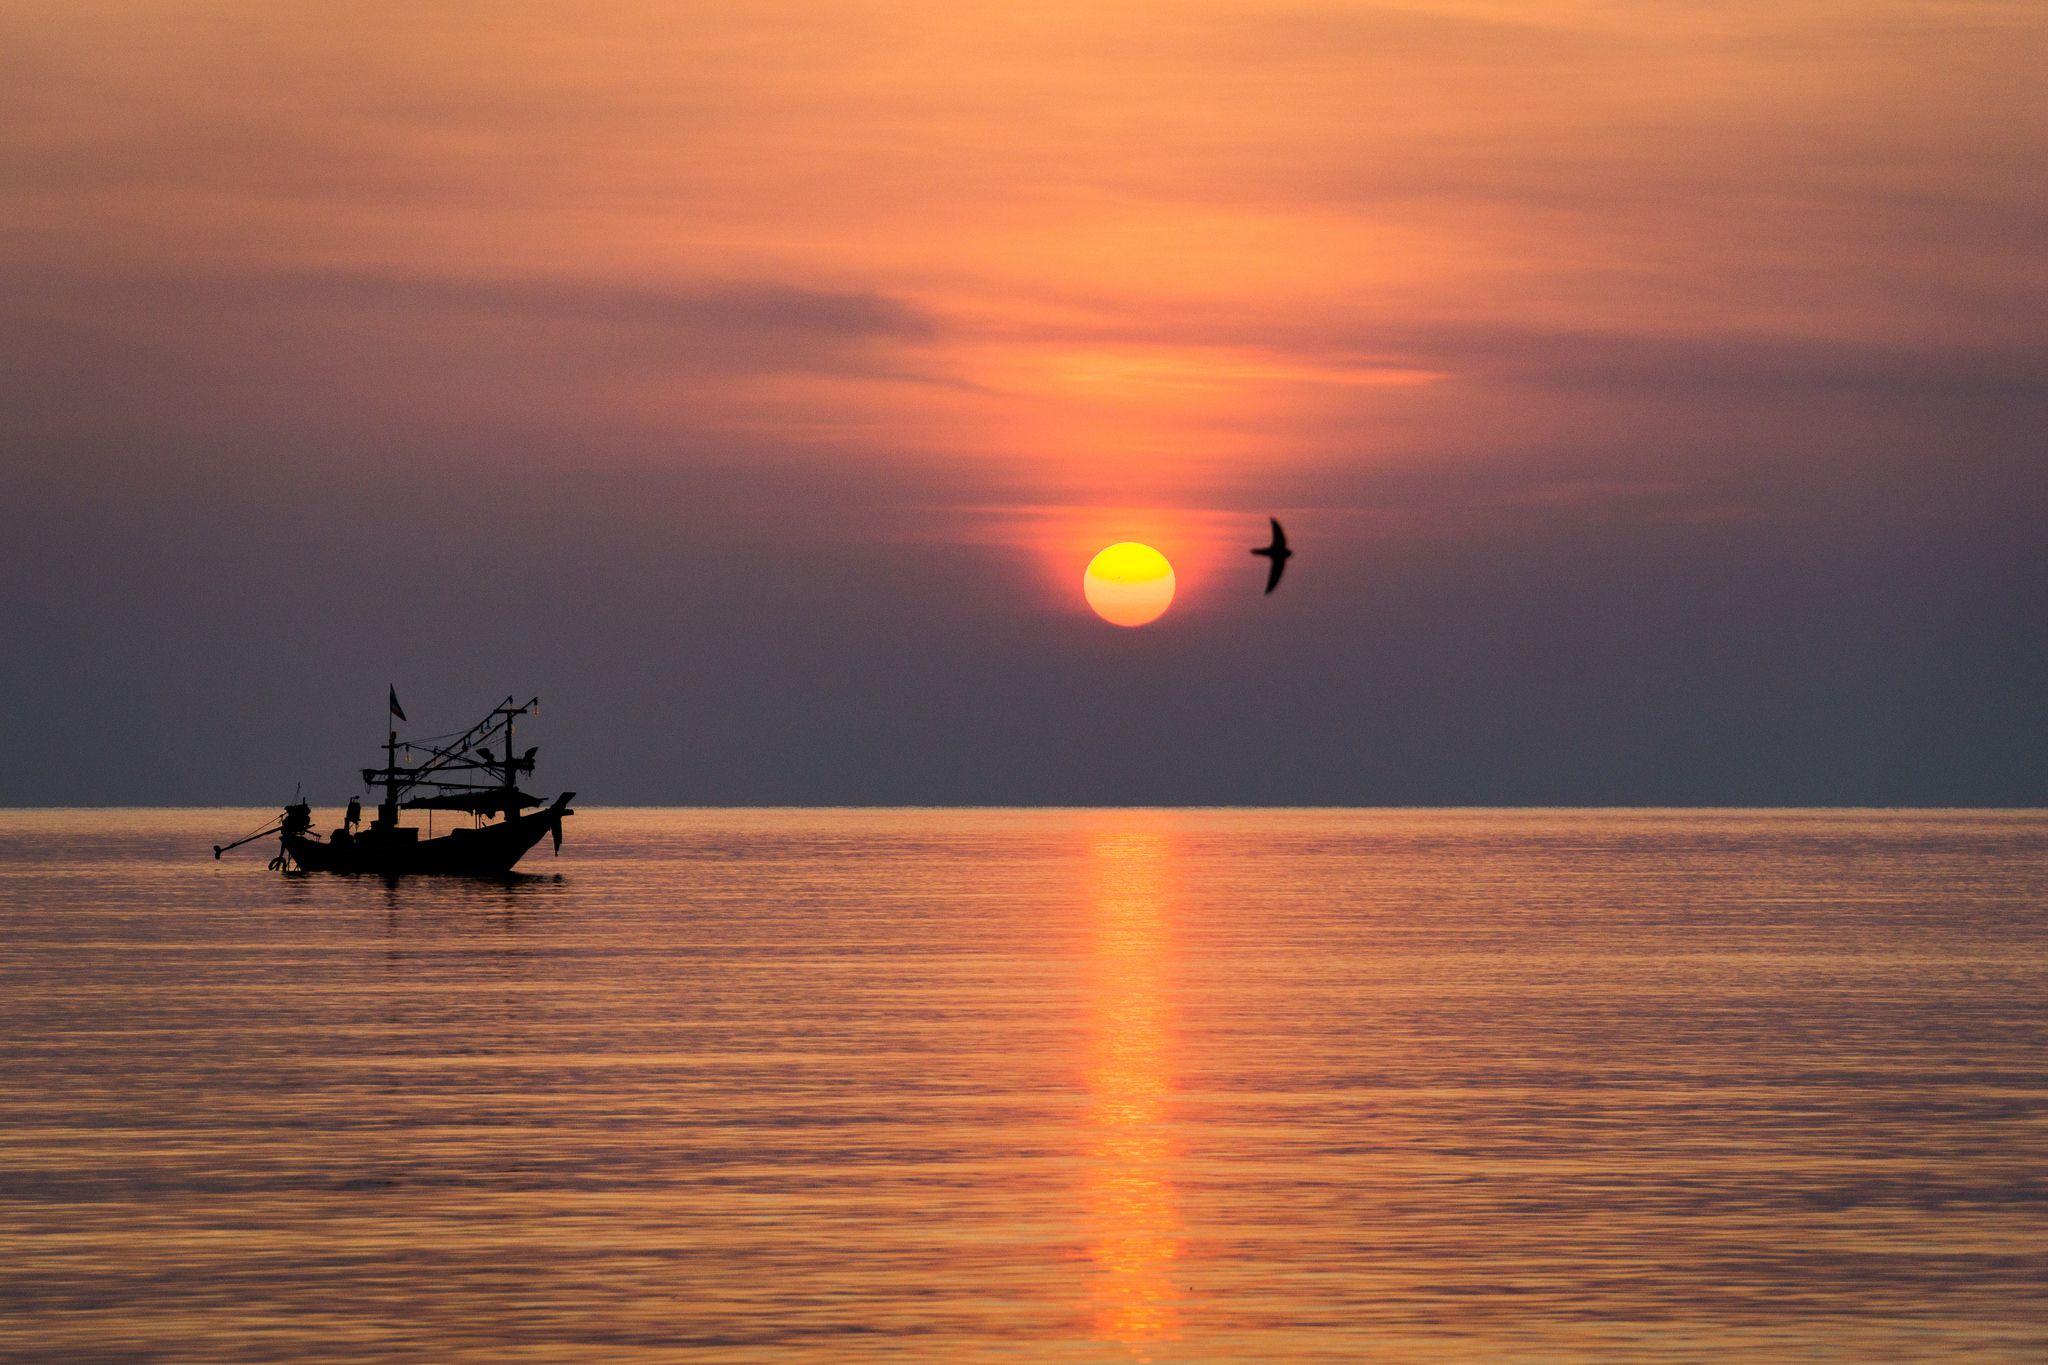 https://flic.kr/p/Fxo5dv   Sunrise   Picture taken at Chaweng Beach, Koh Samui